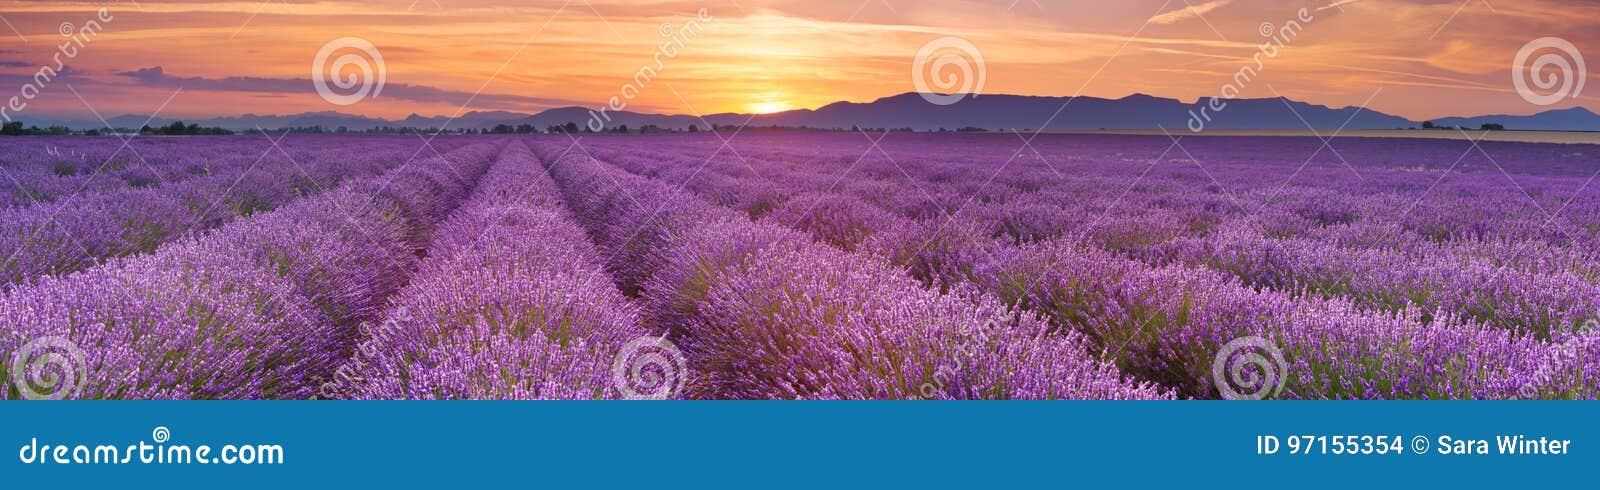 Sonnenaufgang über Feldern des Lavendels in der Provence, Frankreich